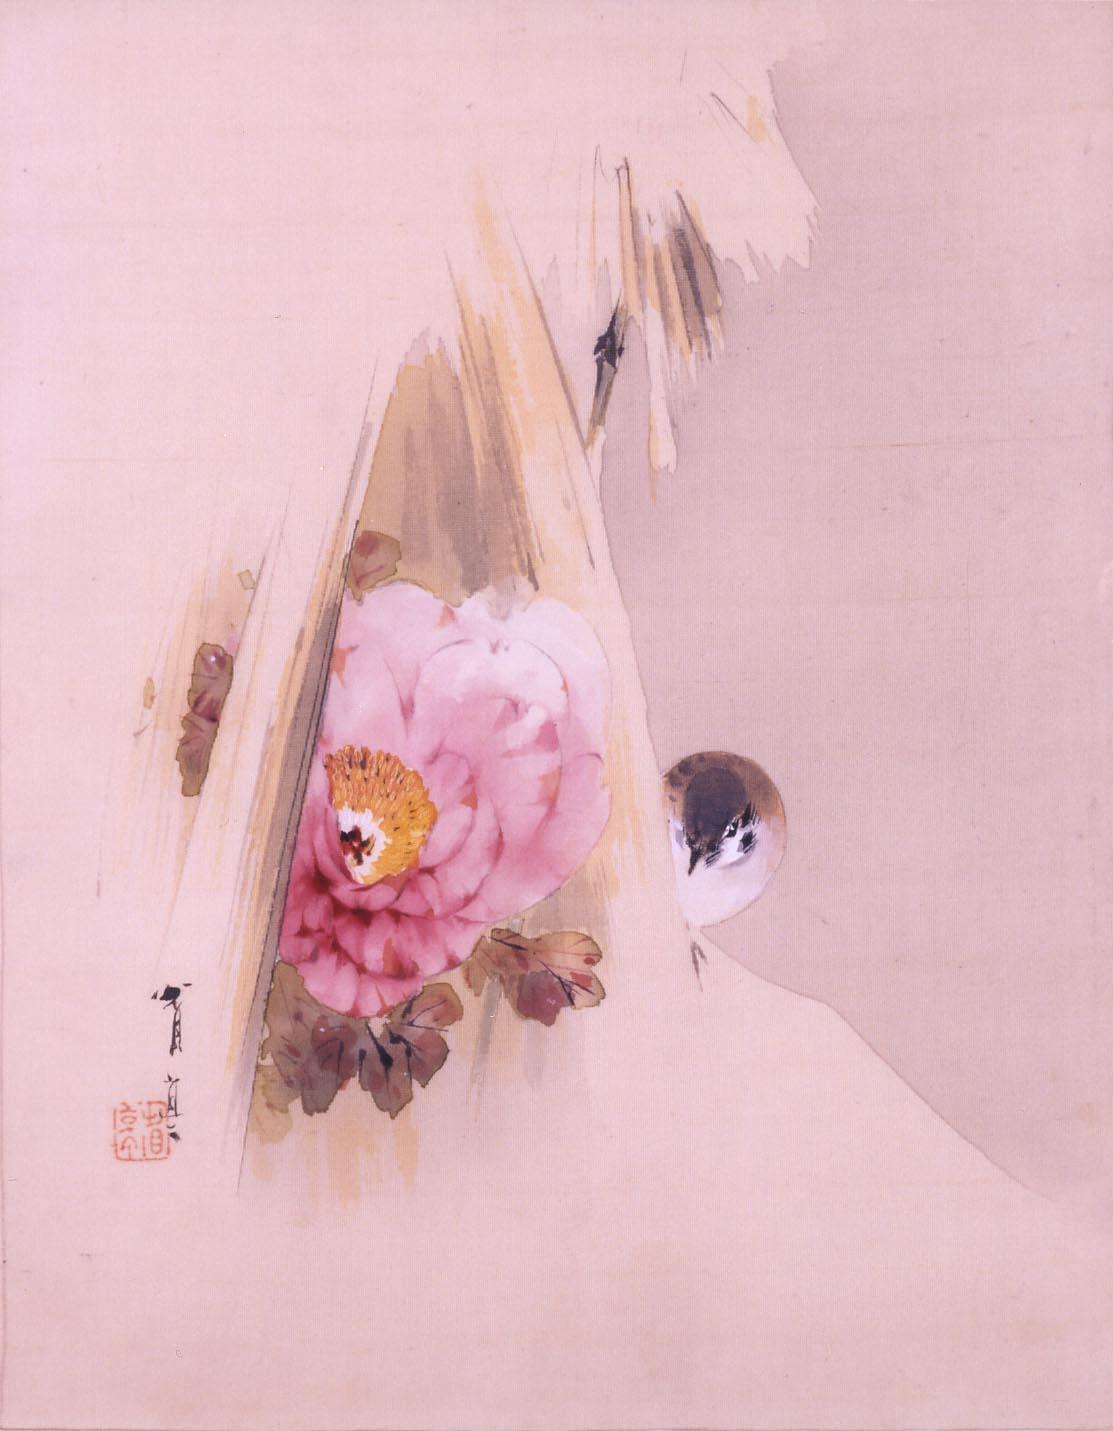 渡辺省亭の画像 p1_10